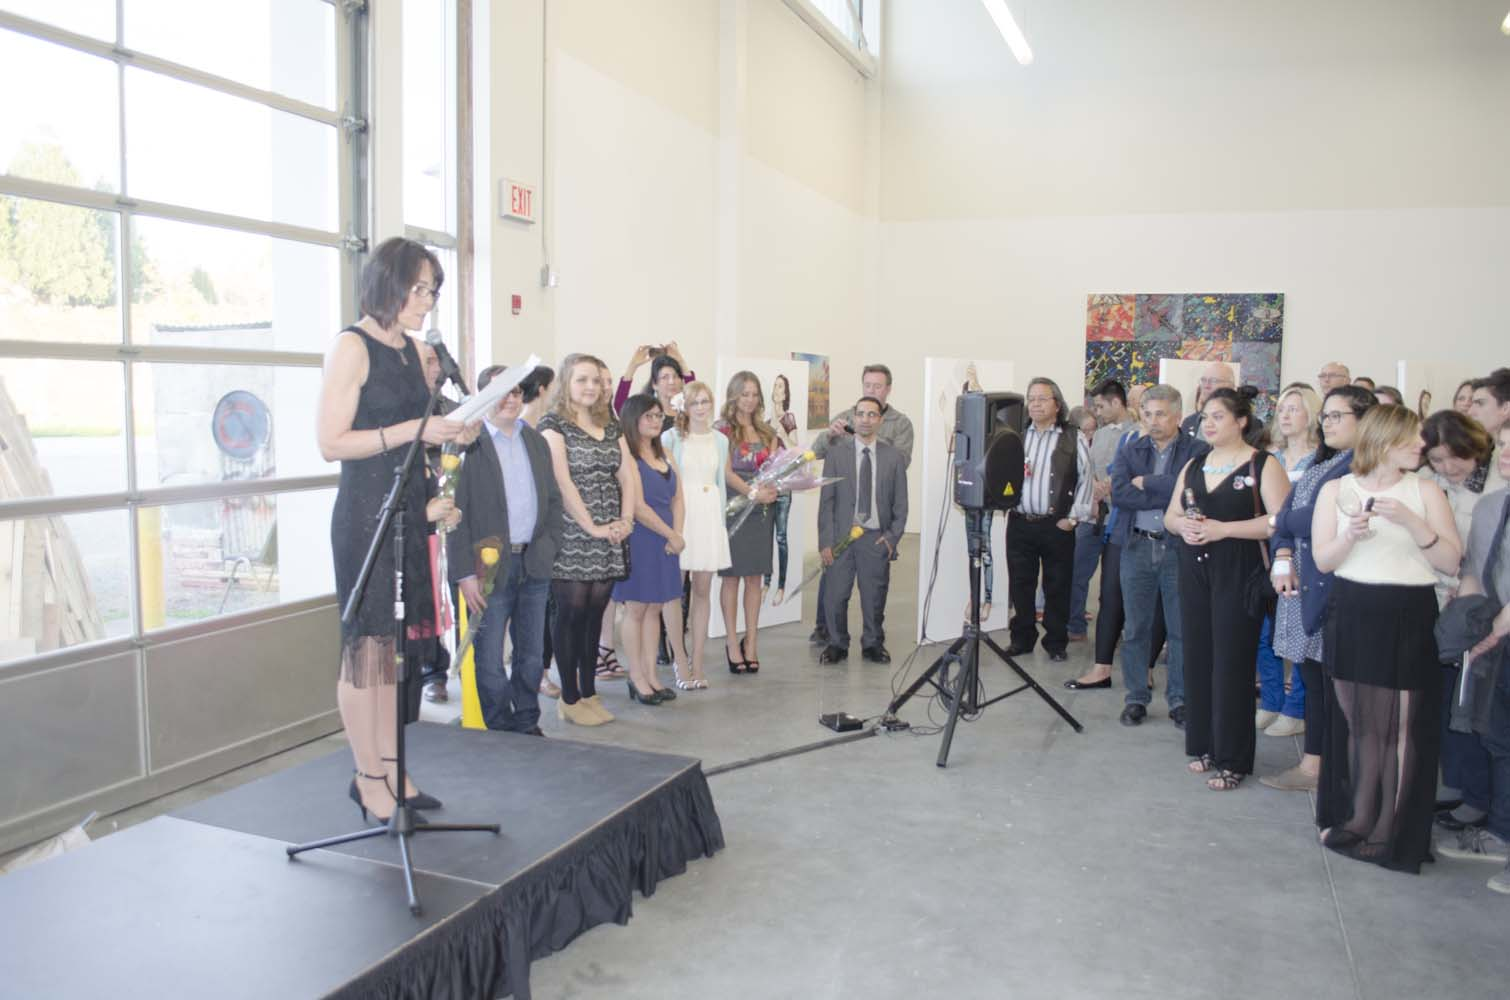 2014-gradshow-event-web_8.jpg